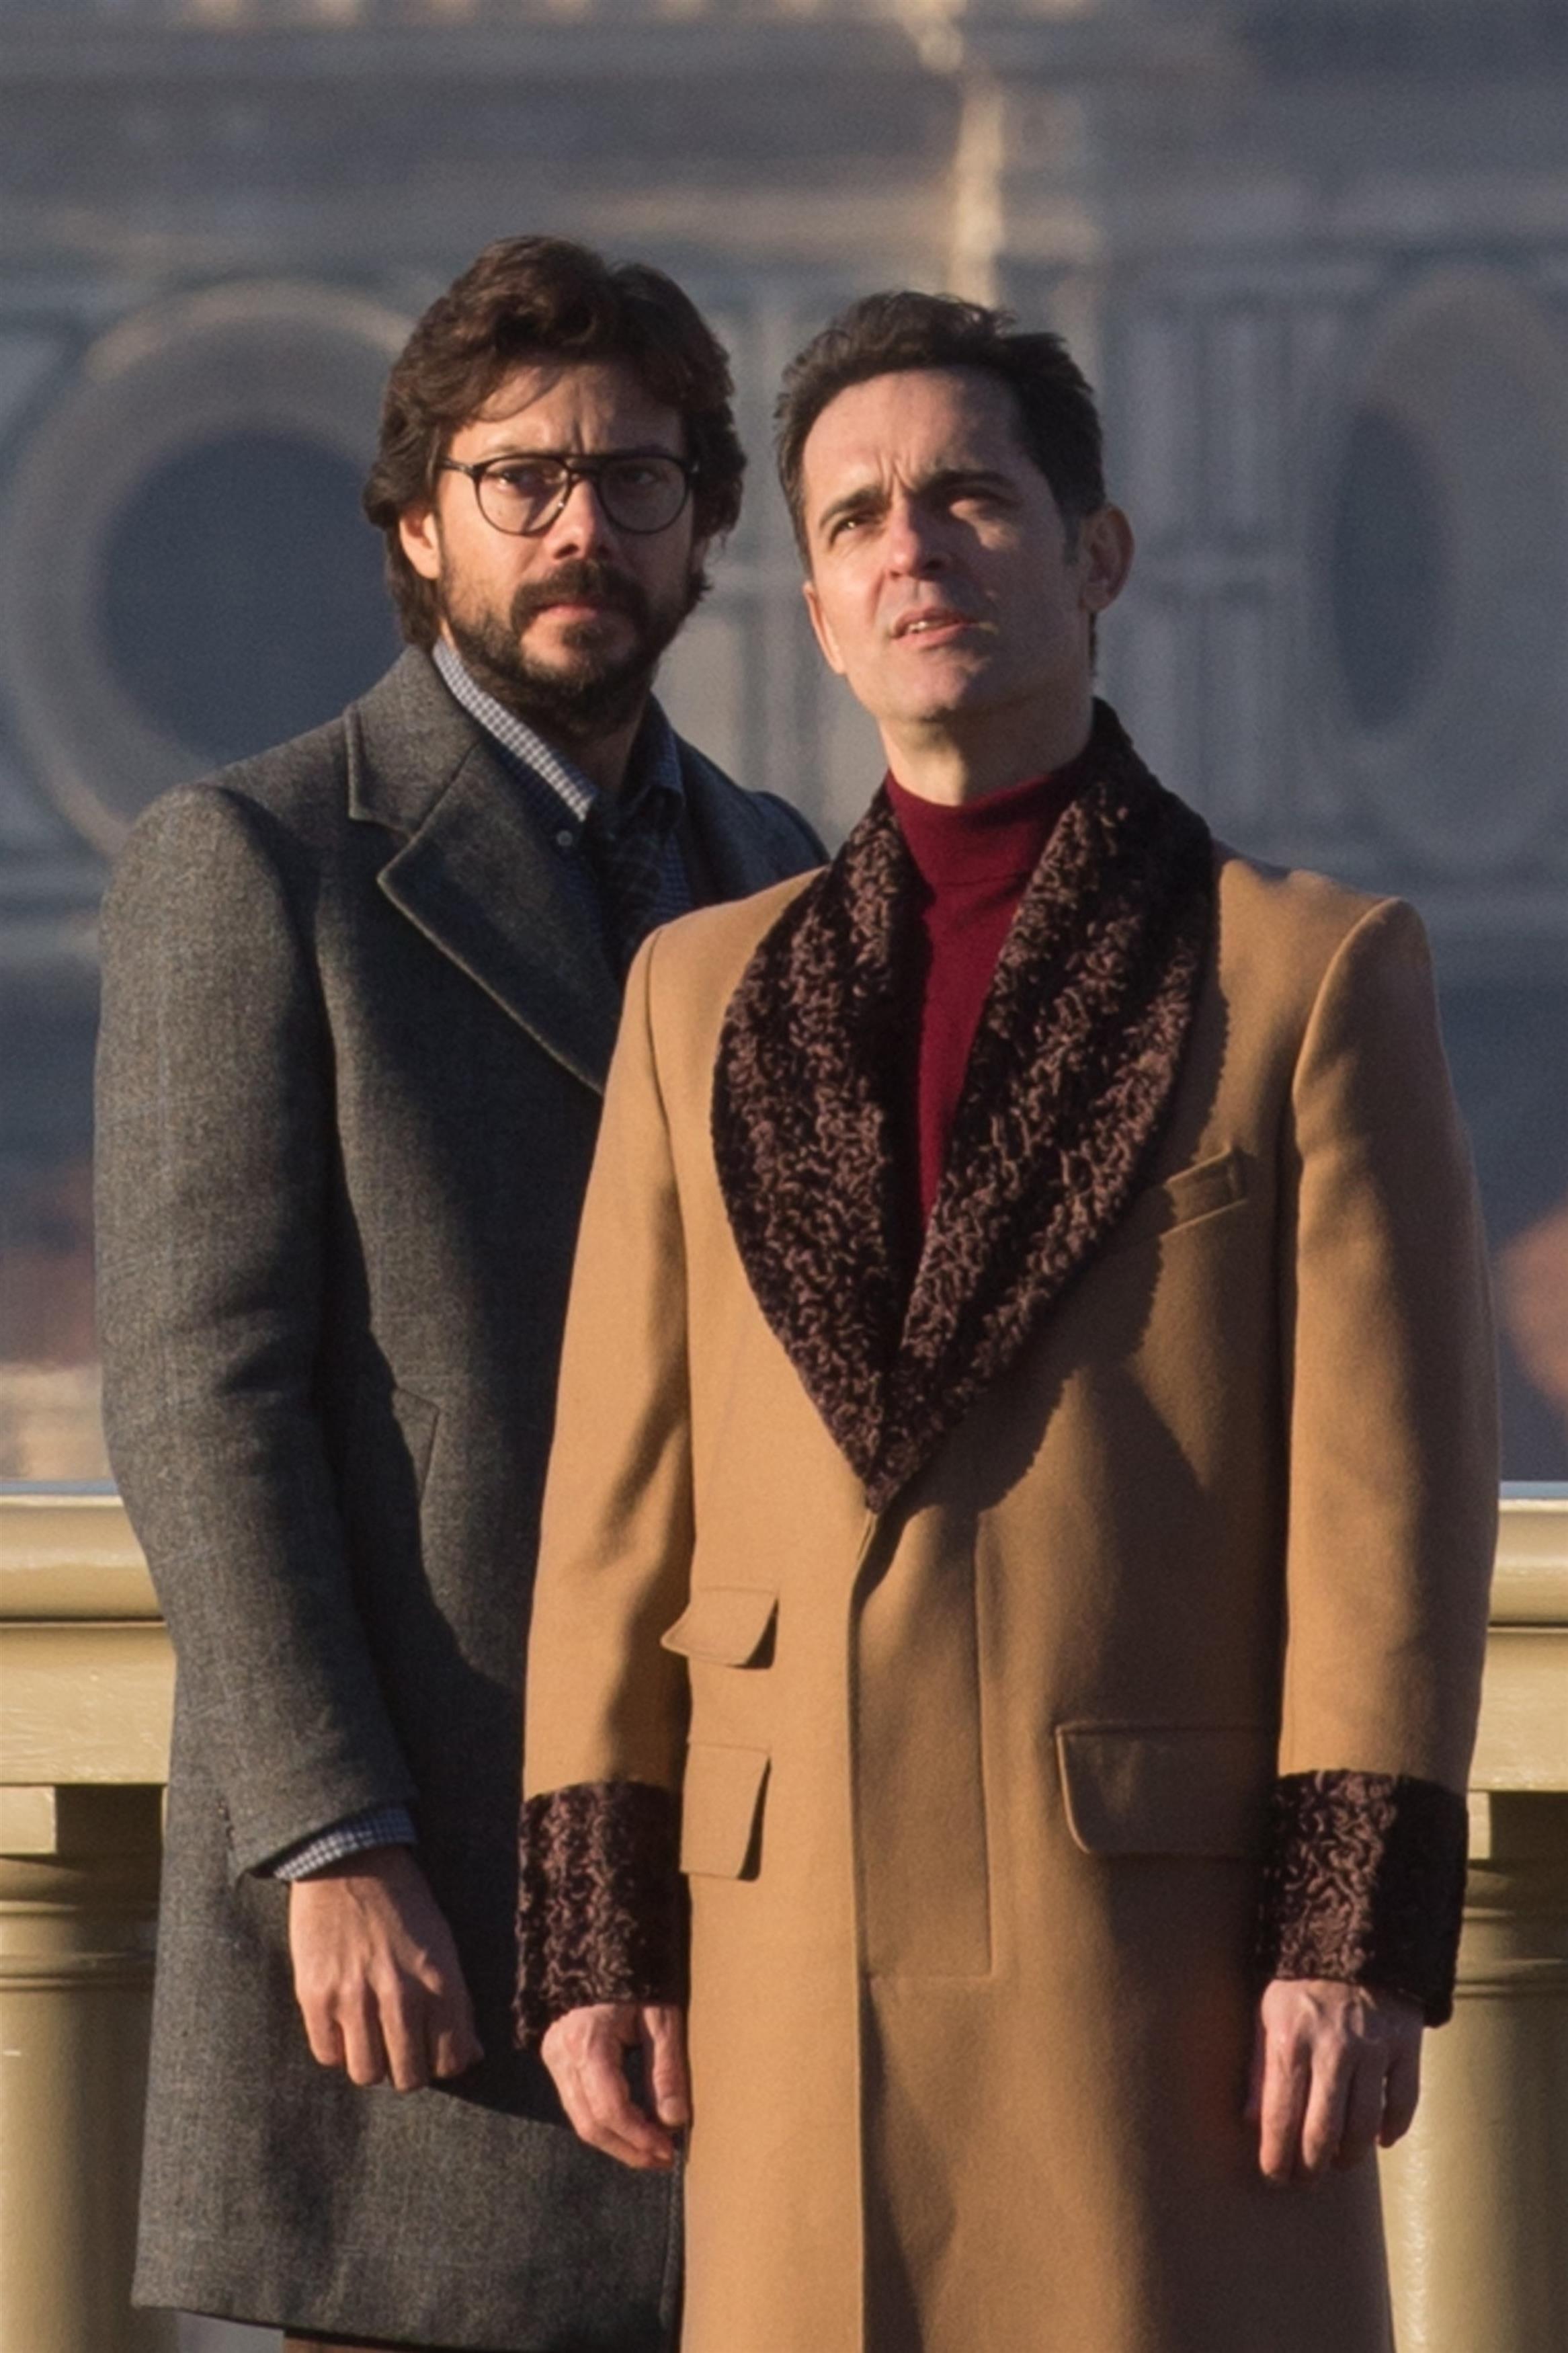 The cast of 'La Casa De Papel' is seen filming in Florence